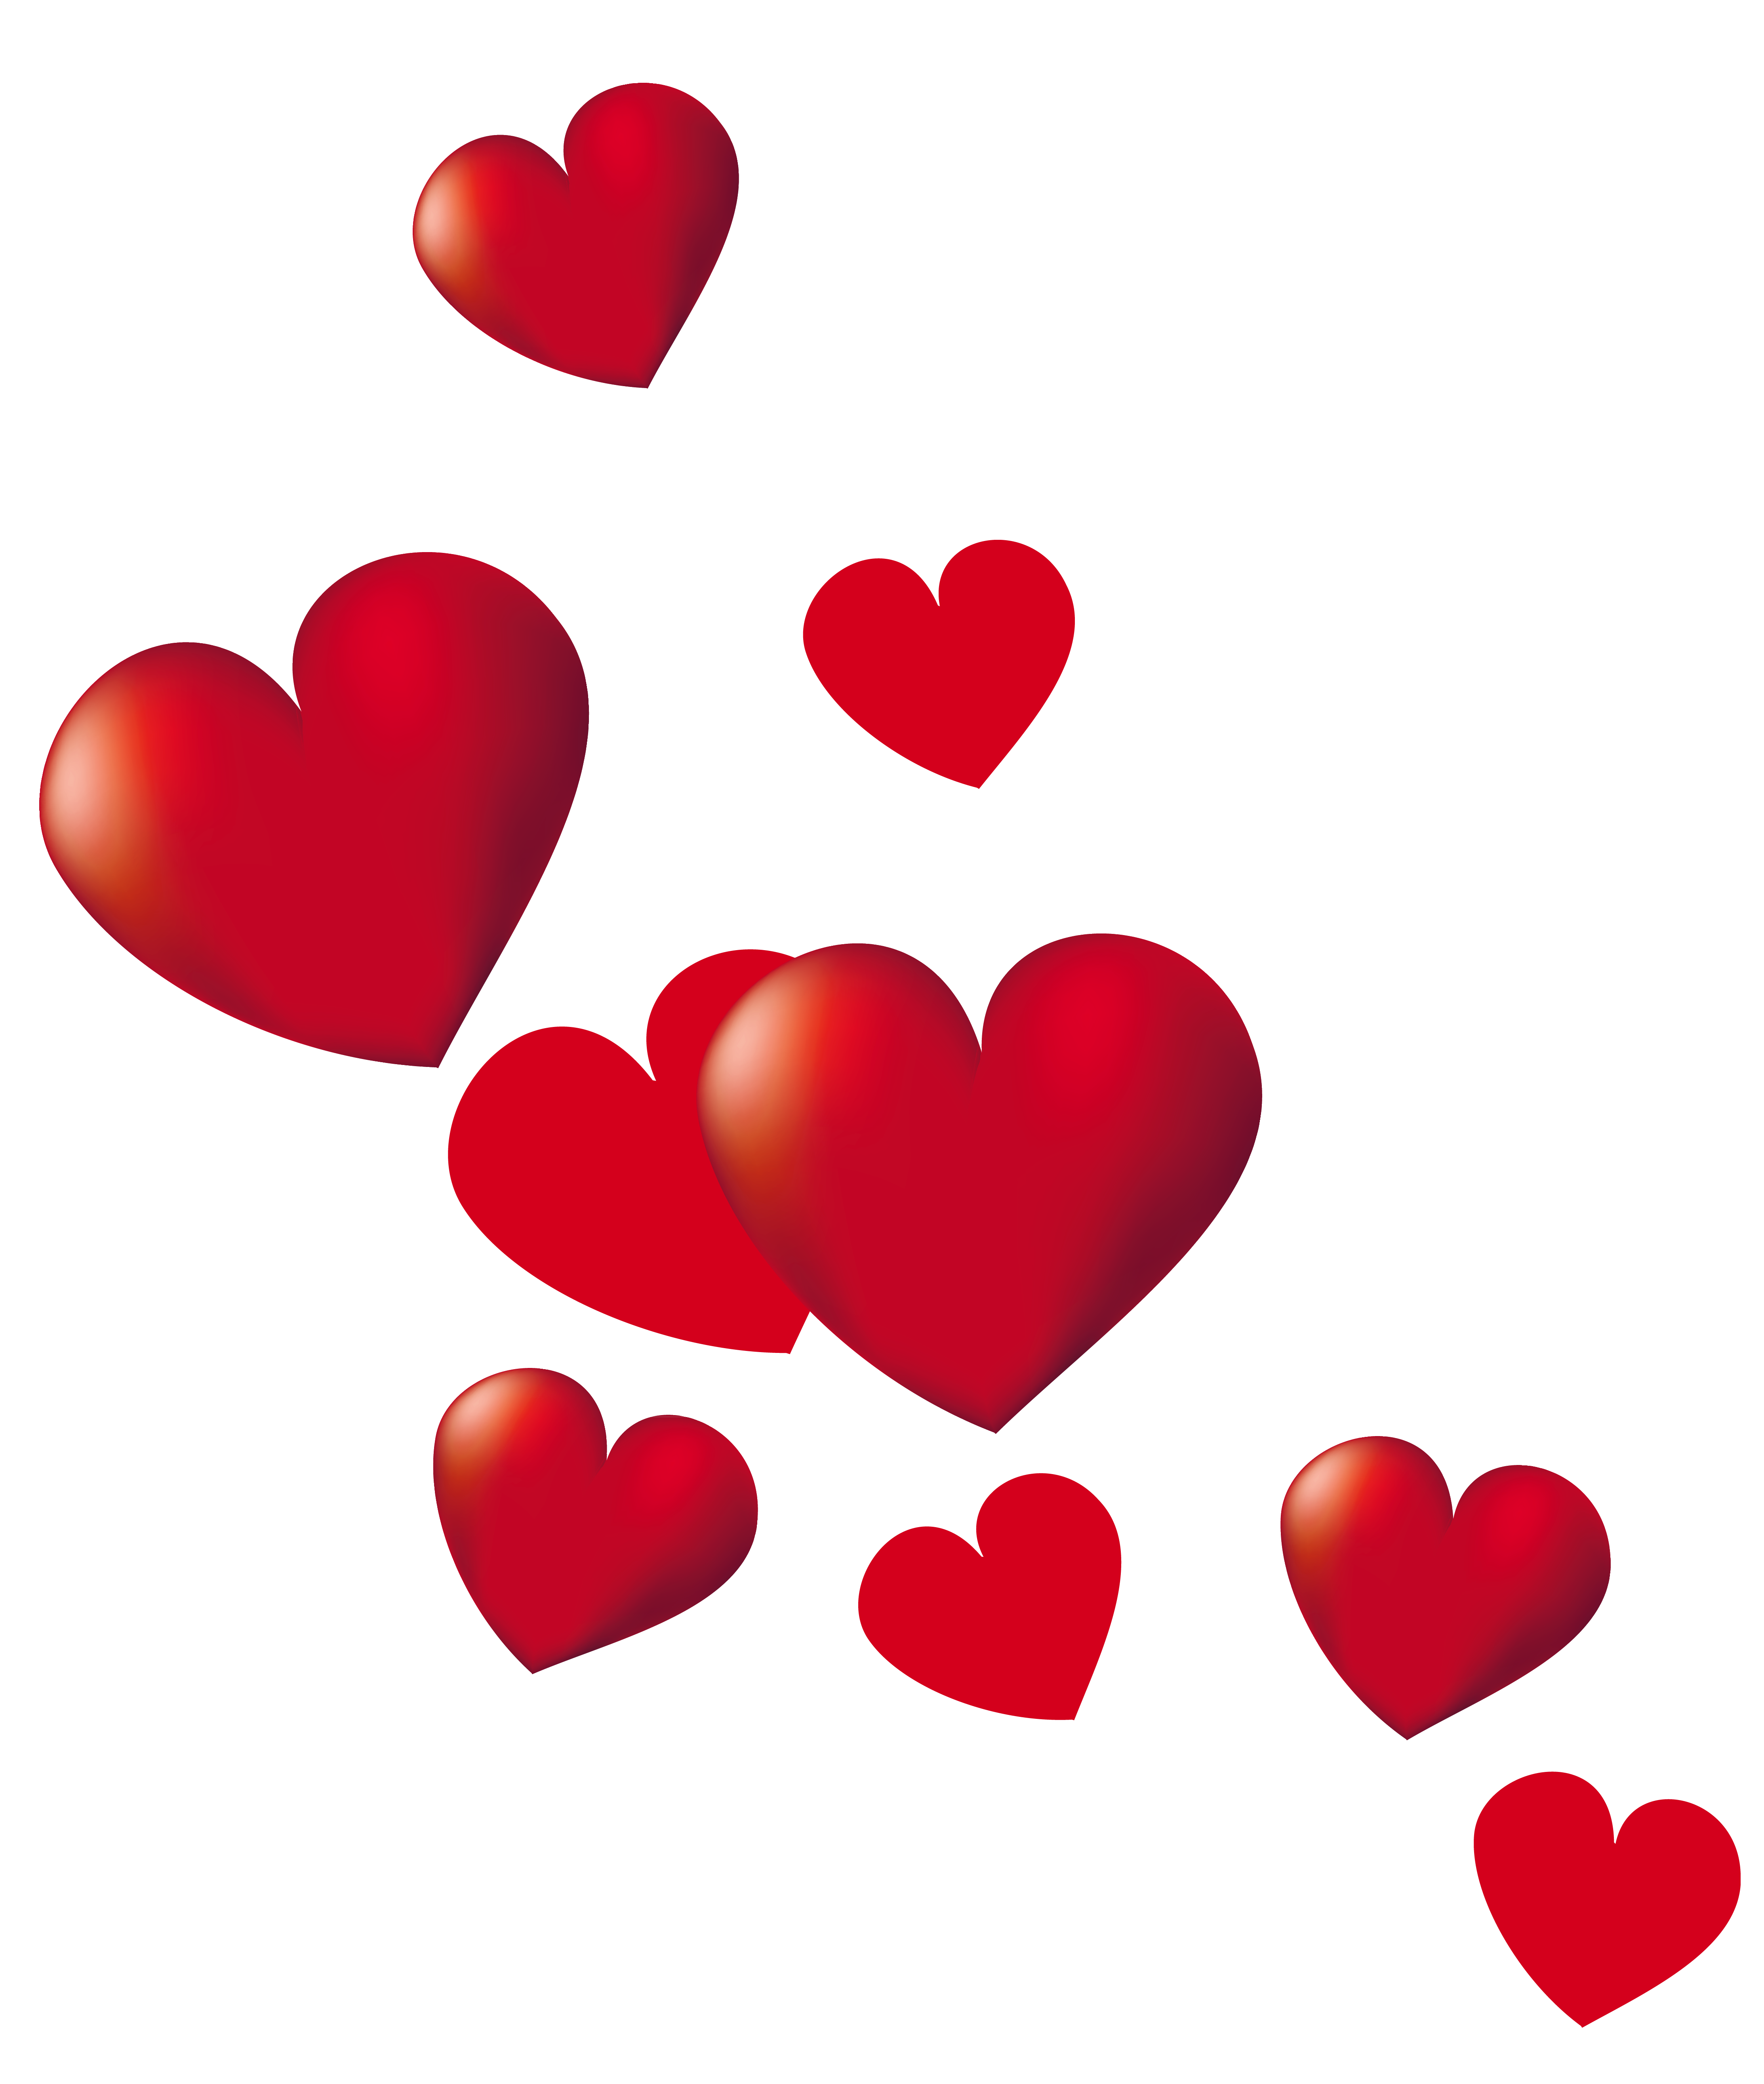 Heart Jpg PNG HD Transparent Heart Jpg HD.PNG Images..